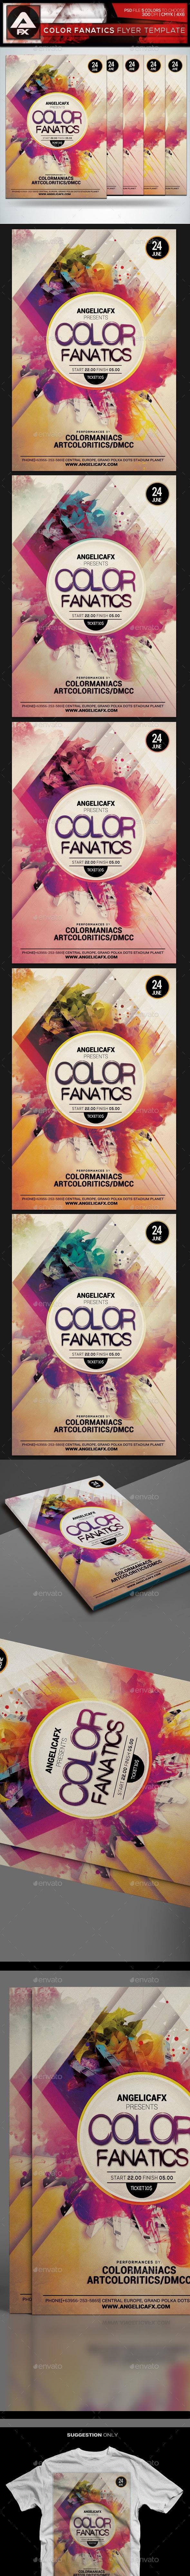 Color Fanatics Flyer Template - Events Flyers